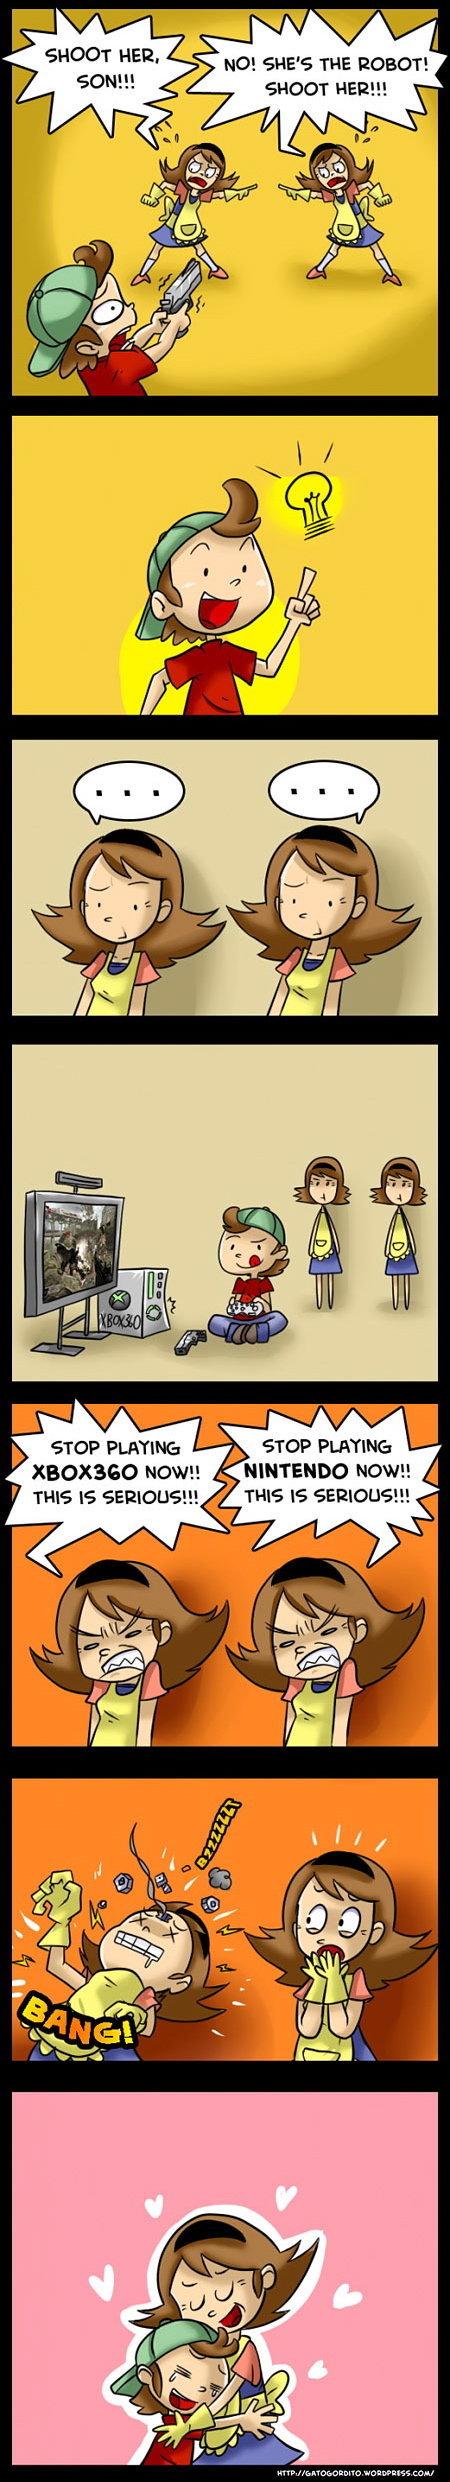 Title. . NO! tittys THE ROBOT! SHEET HER!!! b STOP PLATINA: ', 9, STOP PLAYING: Title NO! tittys THE ROBOT! SHEET HER!!! b STOP PLATINA: ' 9 PLAYING: